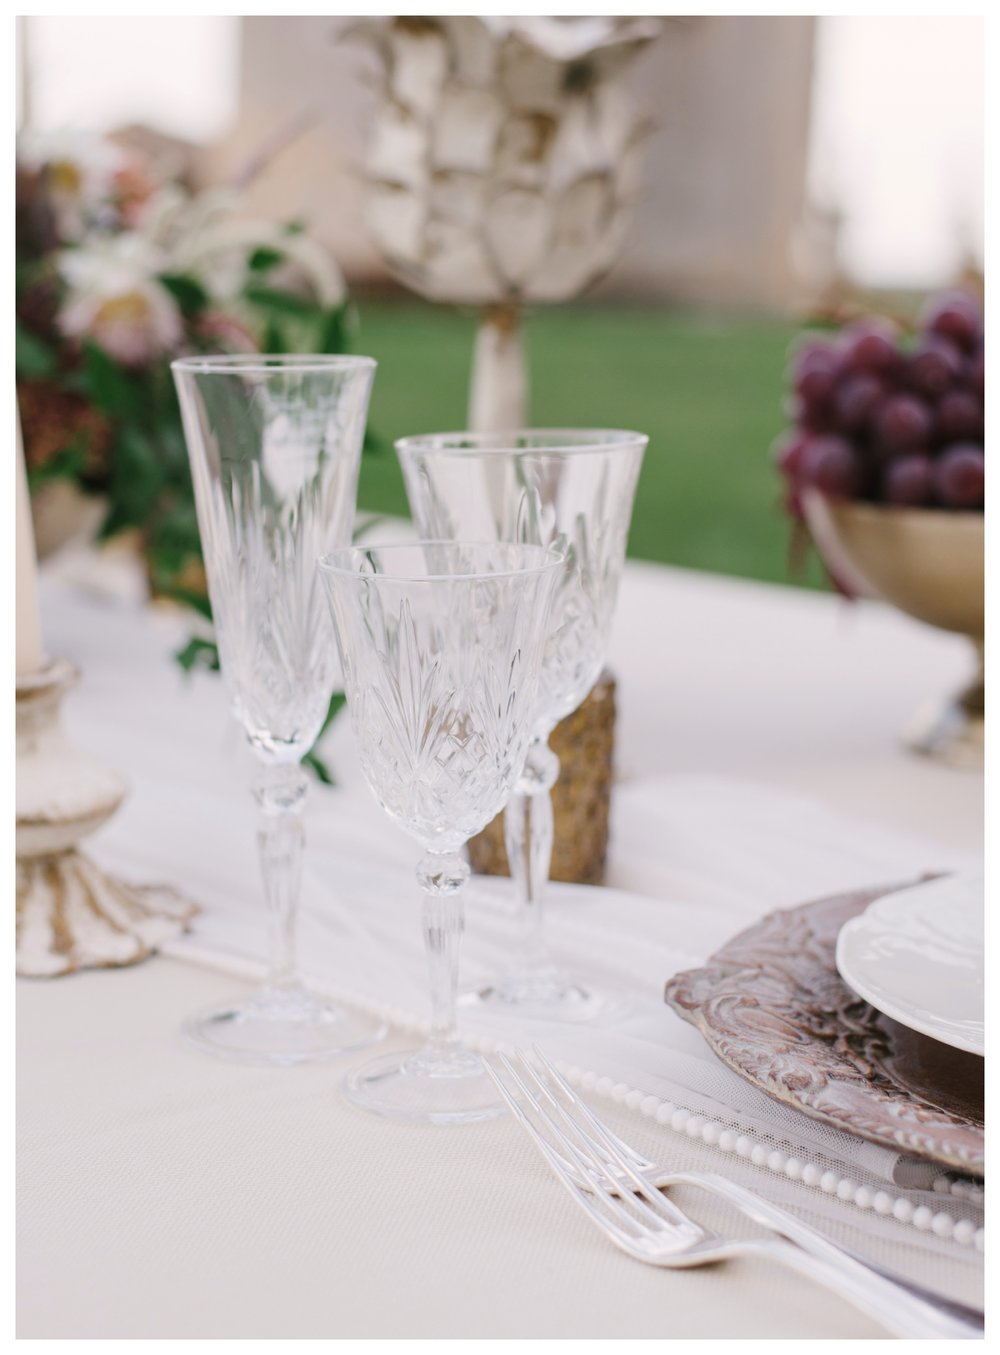 tuscany-castle-wedding-photographer-italy-williamsburgphotostudios-_0006.jpg